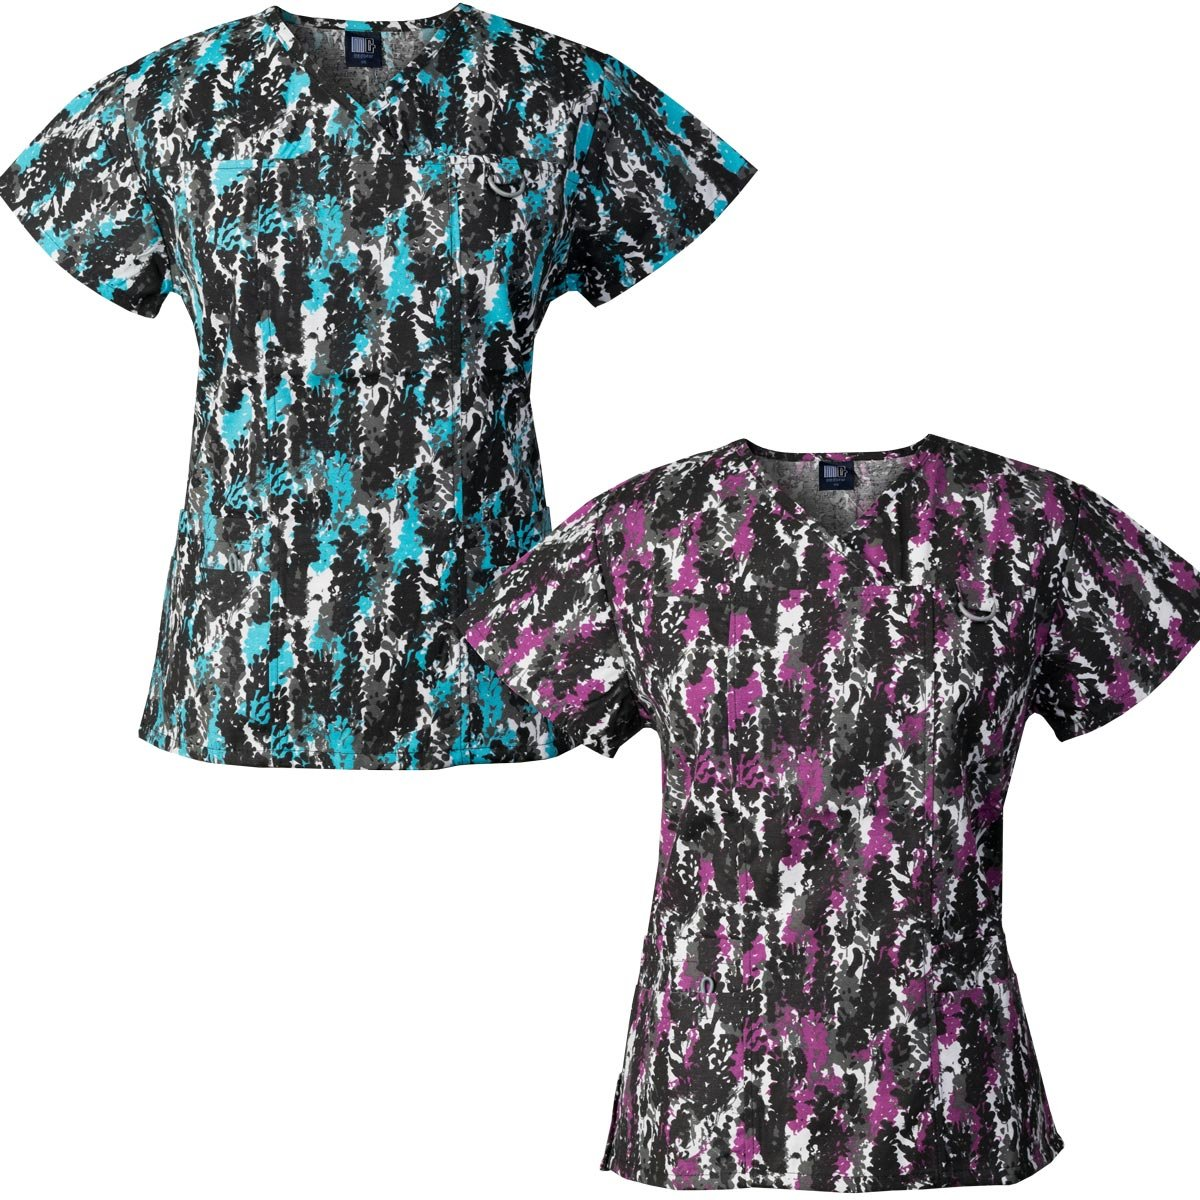 Medgear 2-Pack Womens Printed Scrub Tops with 4 Pockets & ID Loop (L)